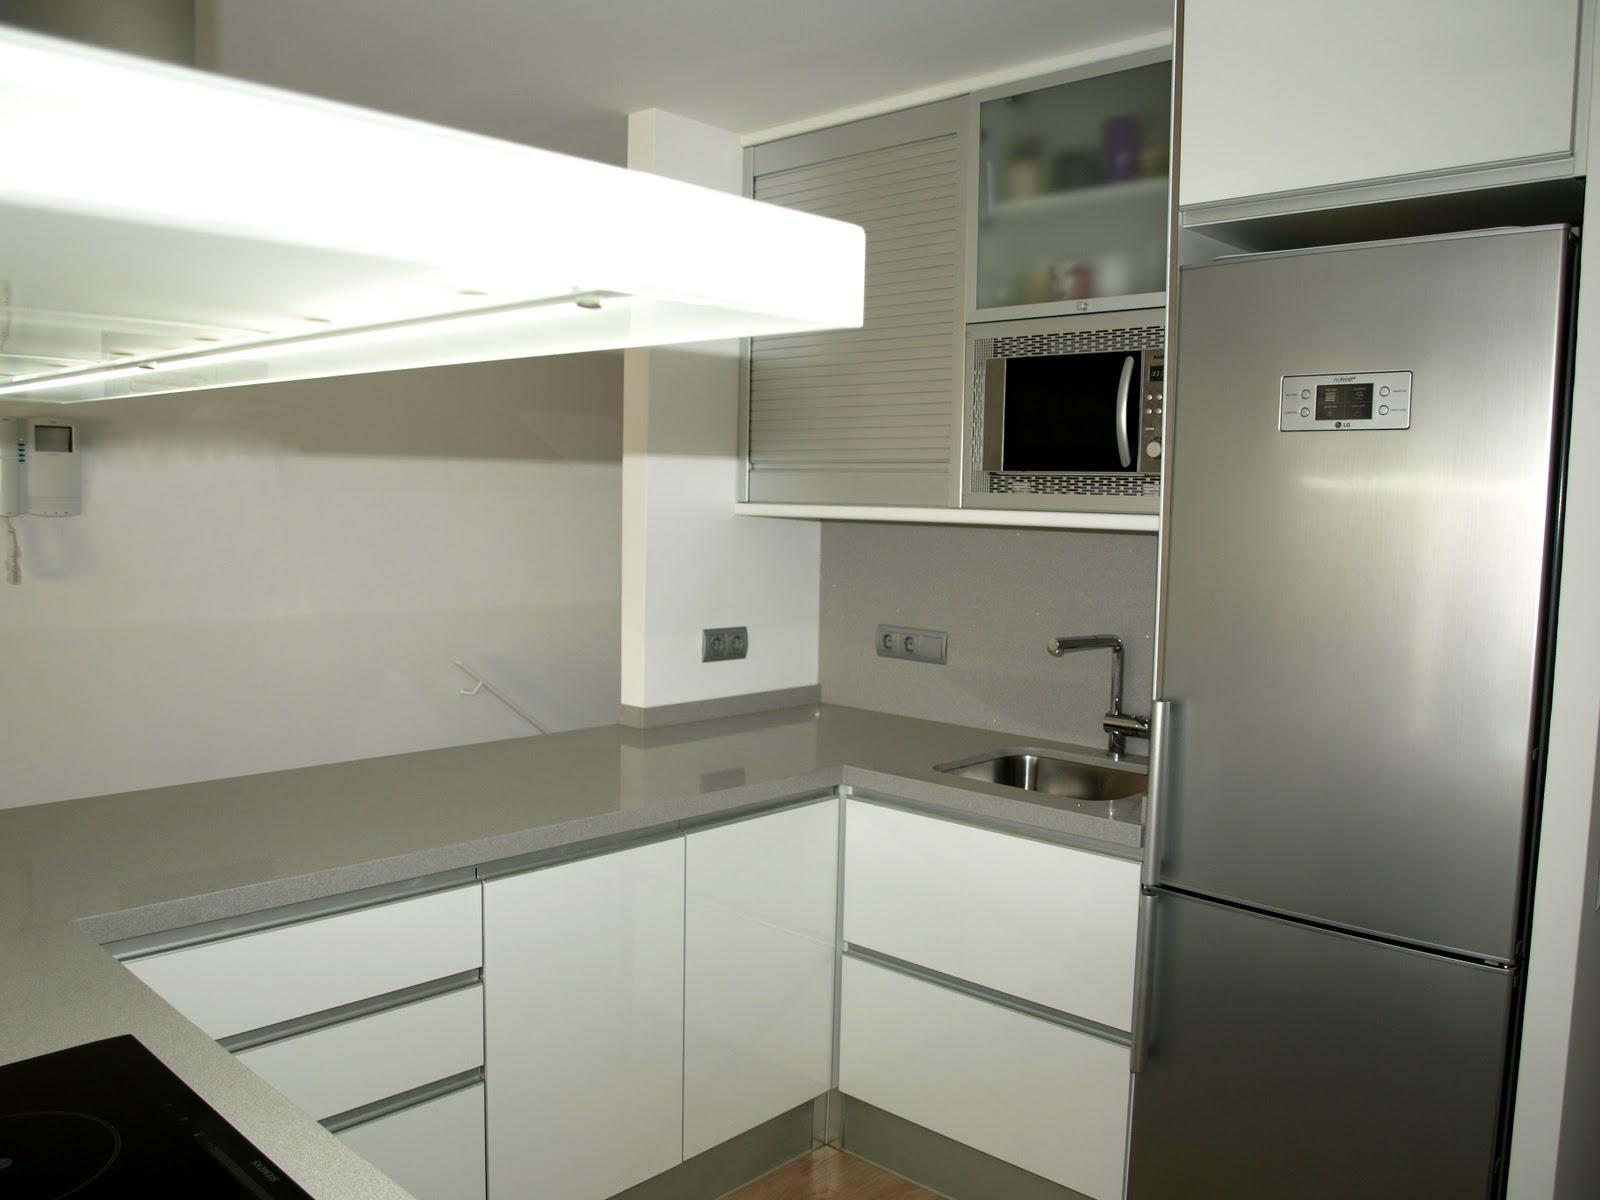 Cocina blanca - Cocinas blancas lacadas ...